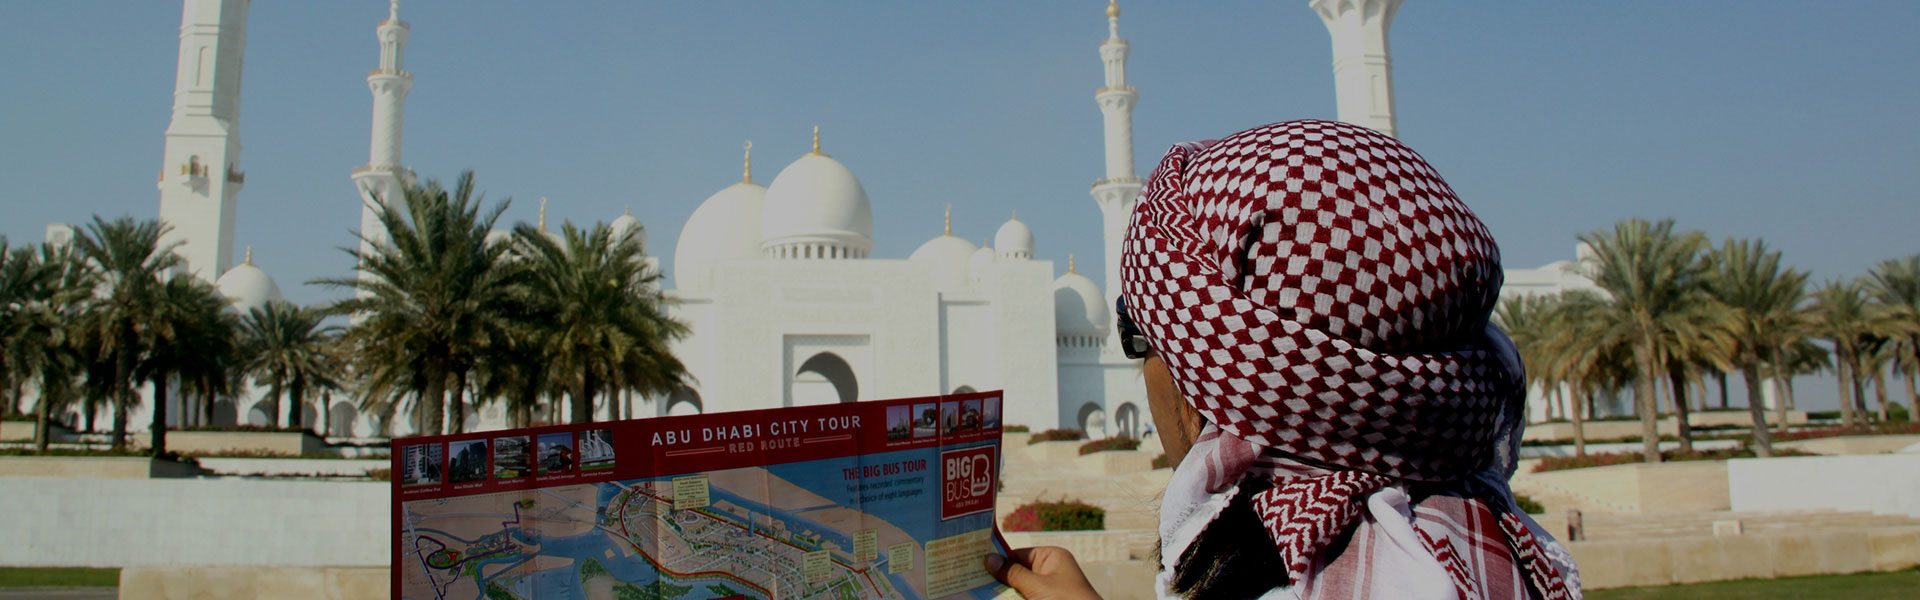 Find a Big Bus stop in Abu-Dhabi